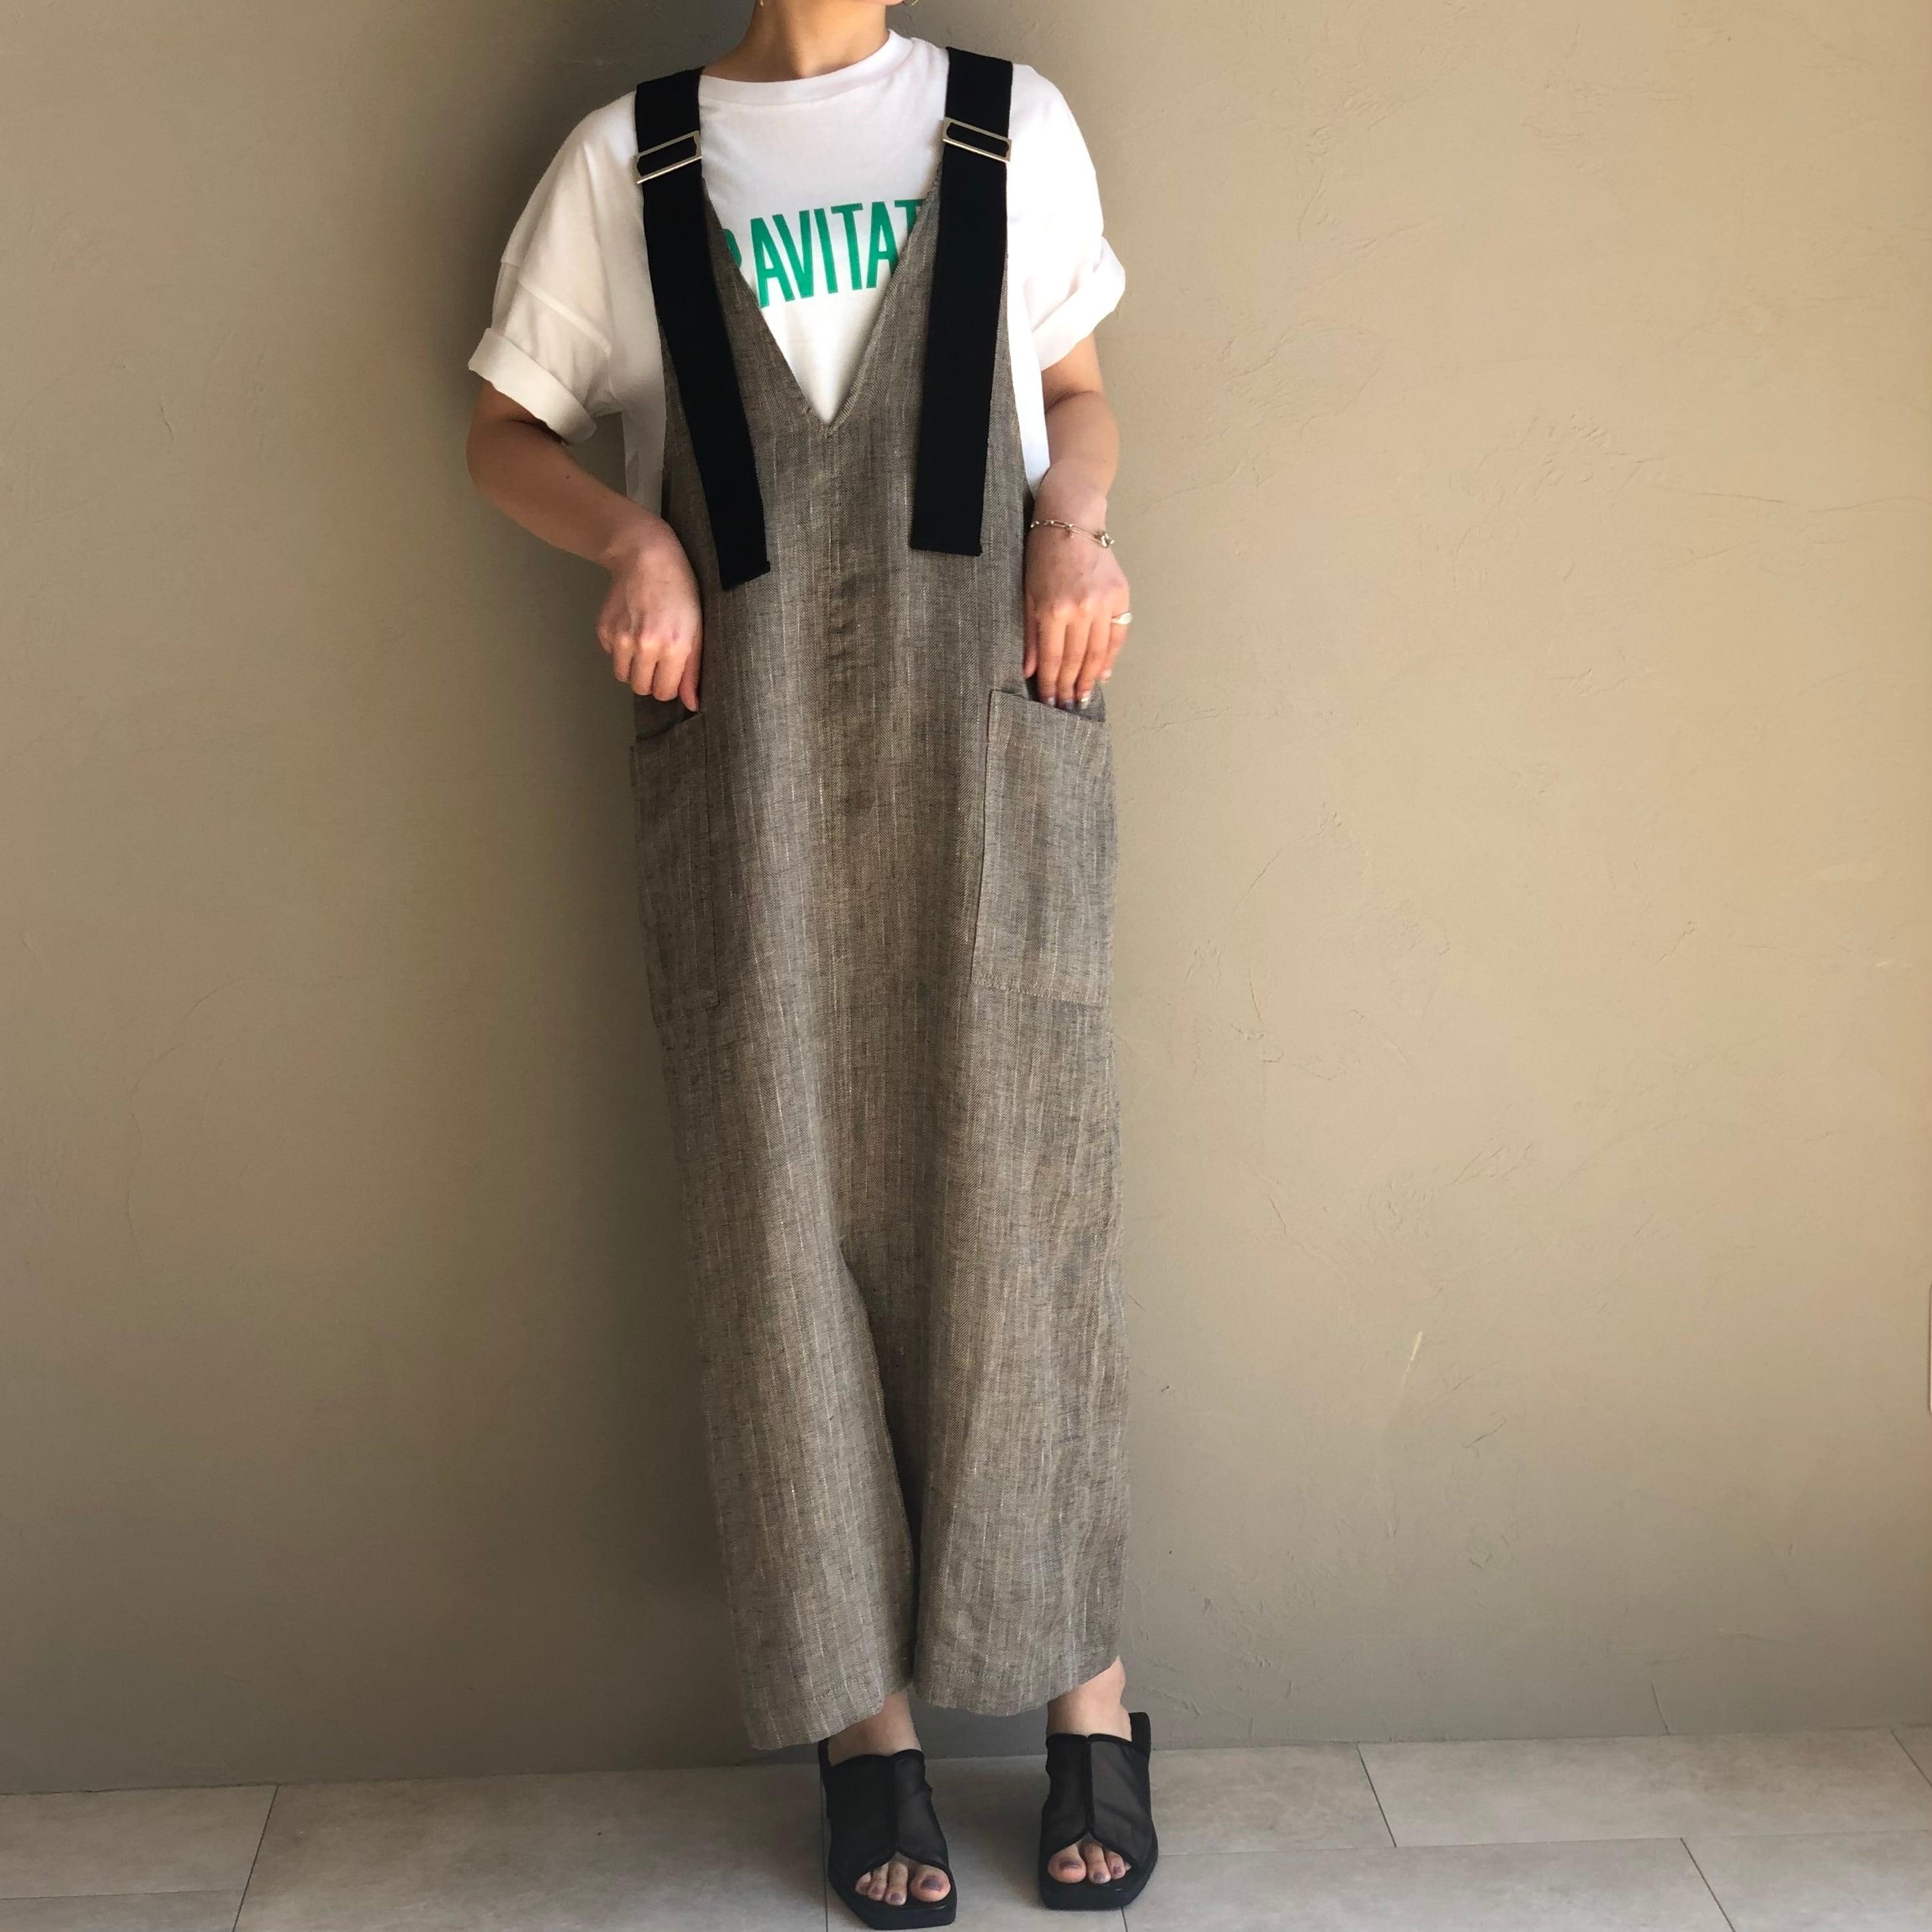 【 CYNICAL 】- 112-95136/112-95137 - 麻デニムジャンパースカート/麻ストライプジャンパースカート